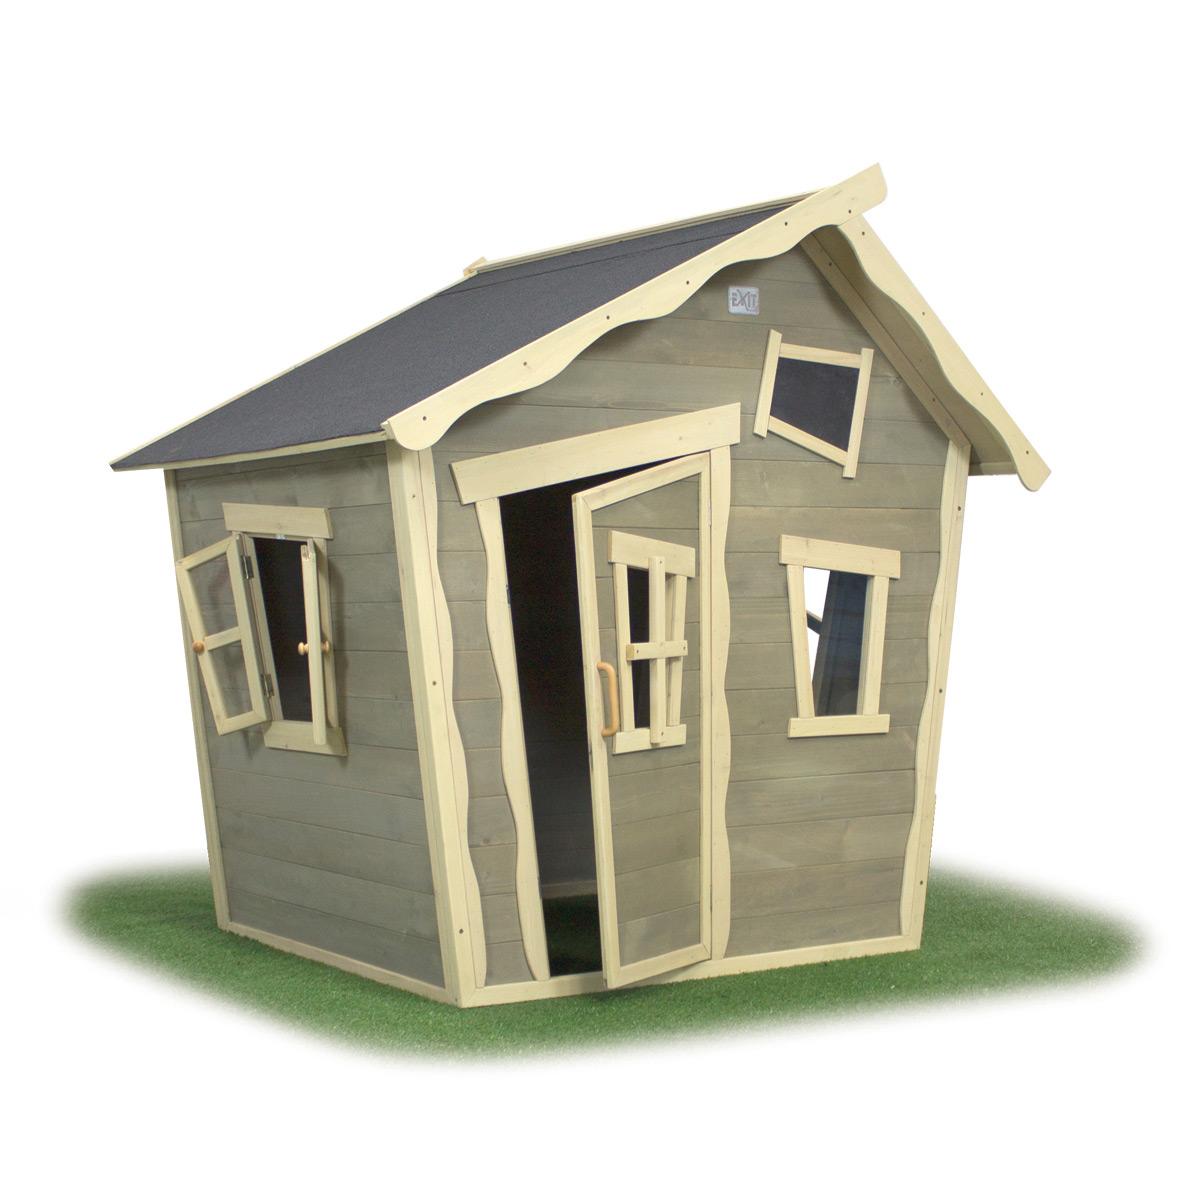 kinder spielhaus exit crooky 100 kinderspielhaus. Black Bedroom Furniture Sets. Home Design Ideas